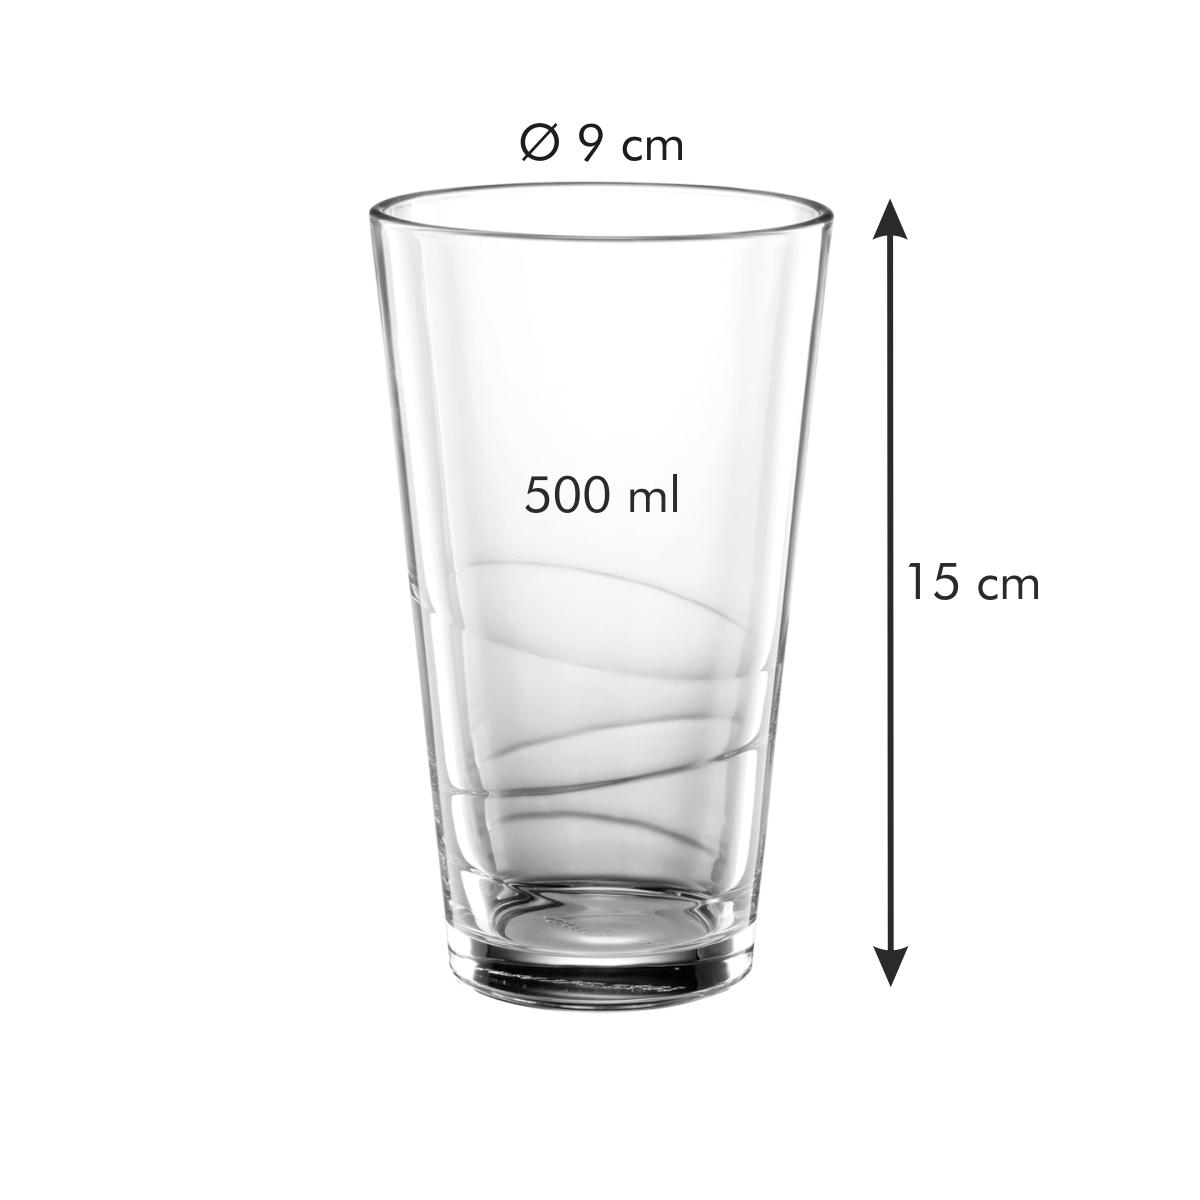 Sklenice myDRINK 500 ml